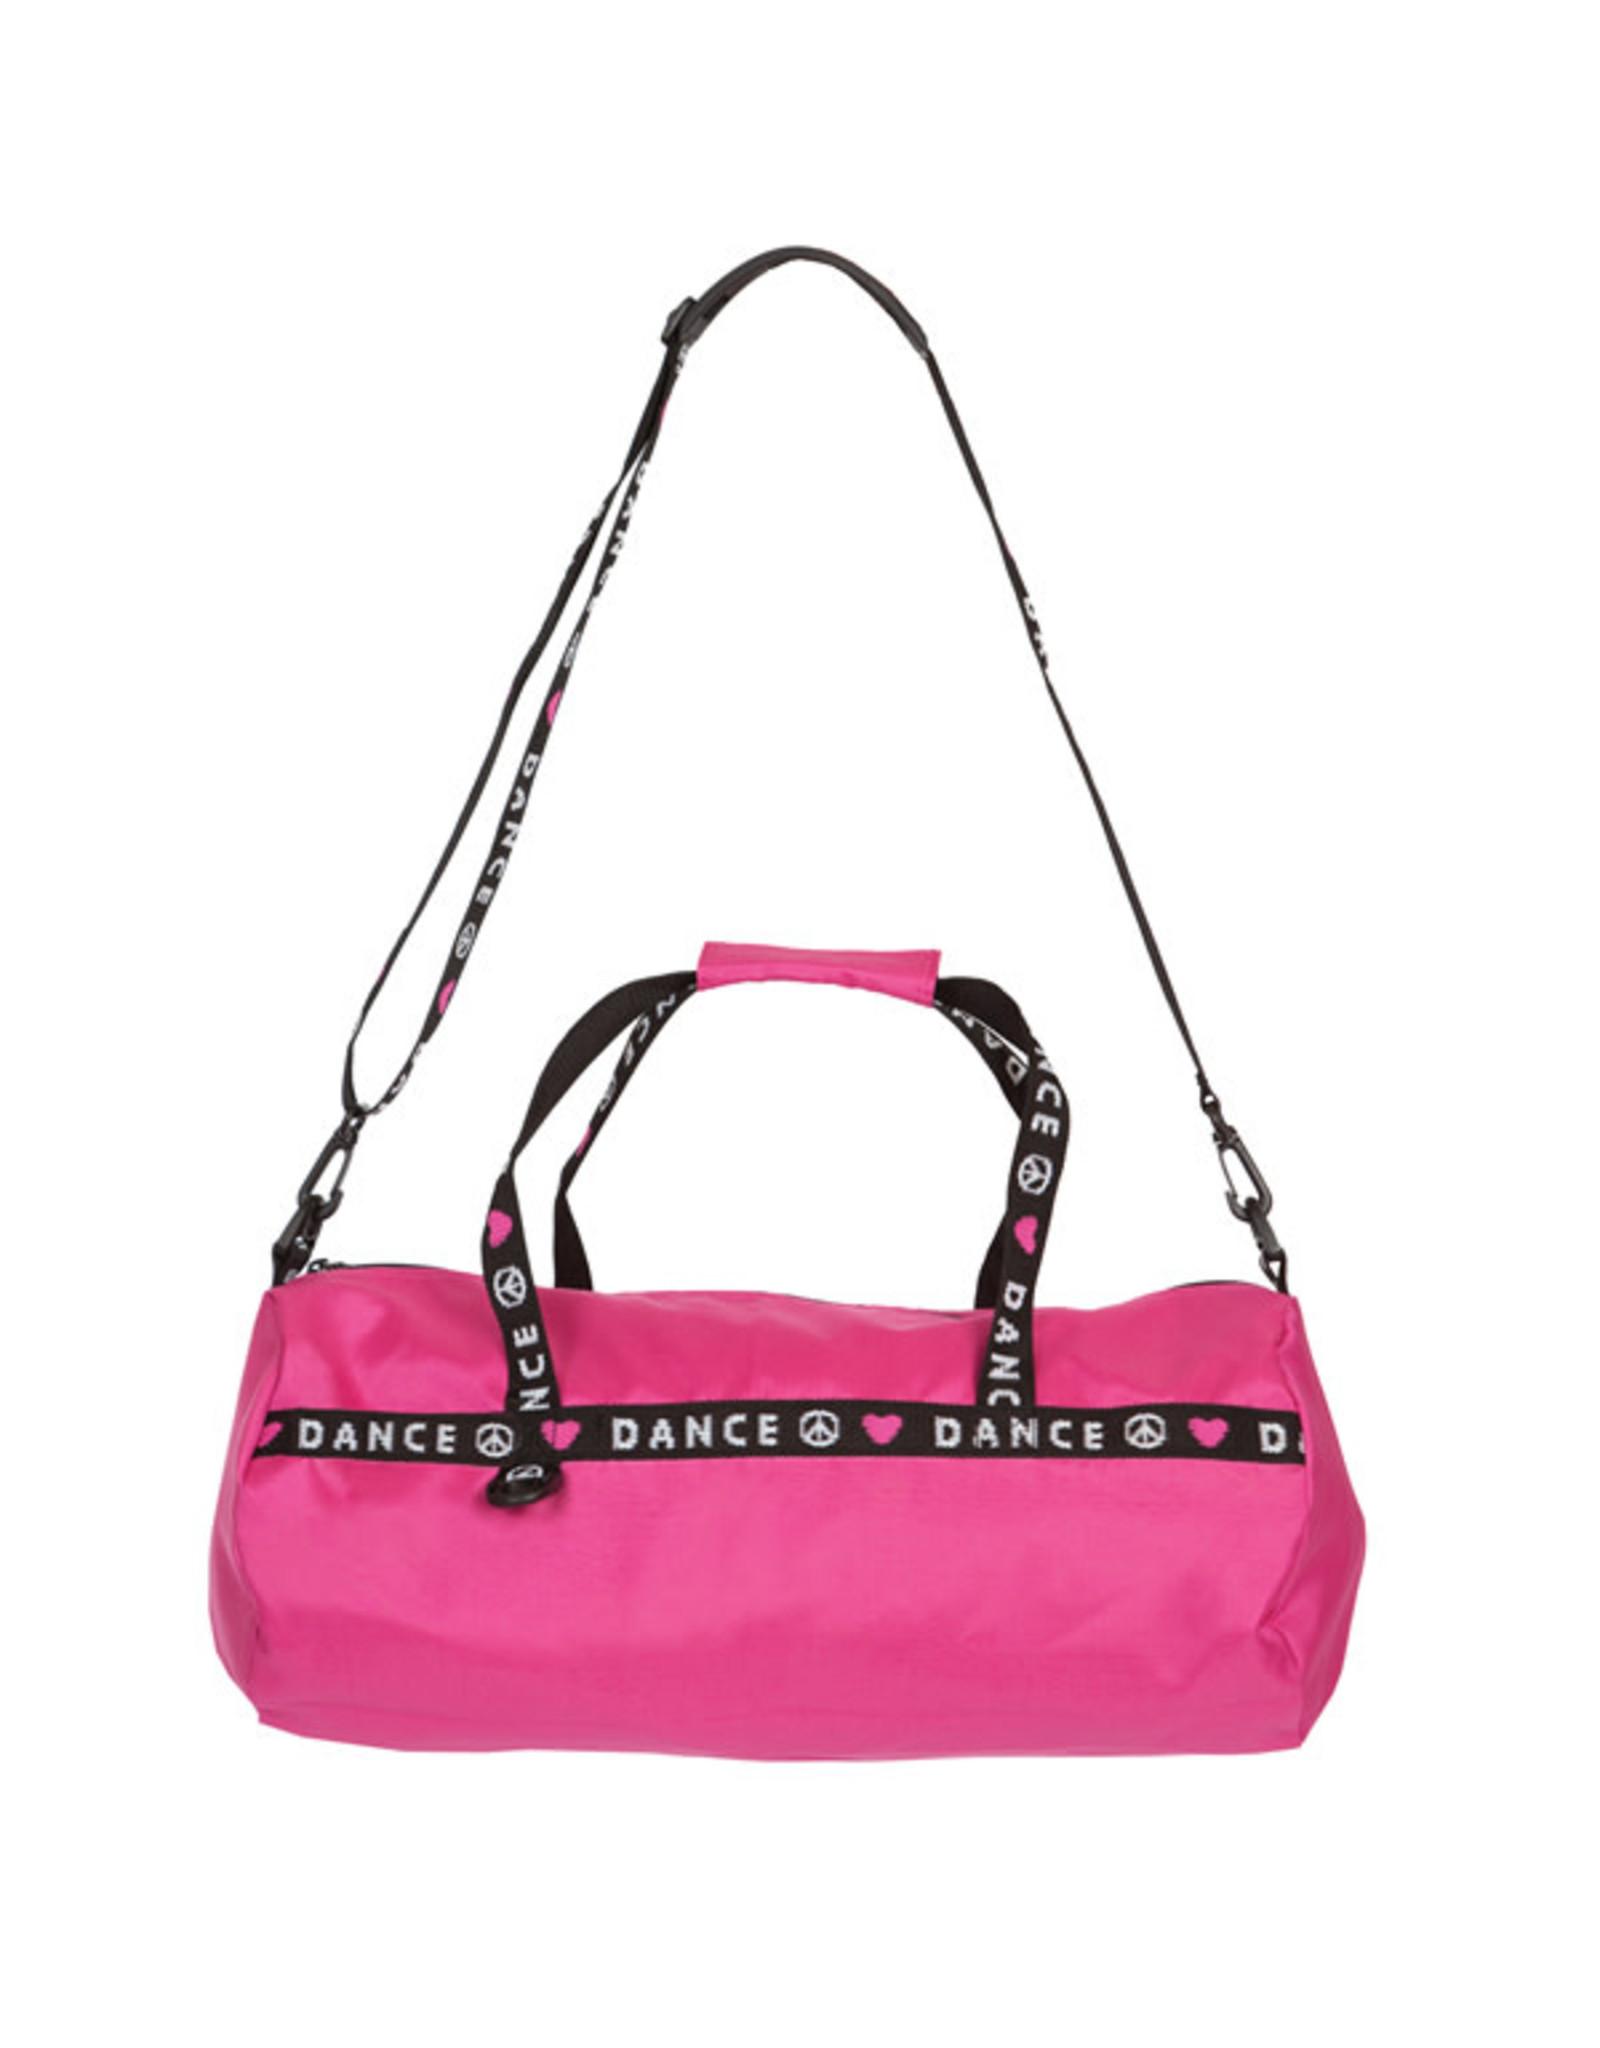 Capezio B81 Dance bag Black